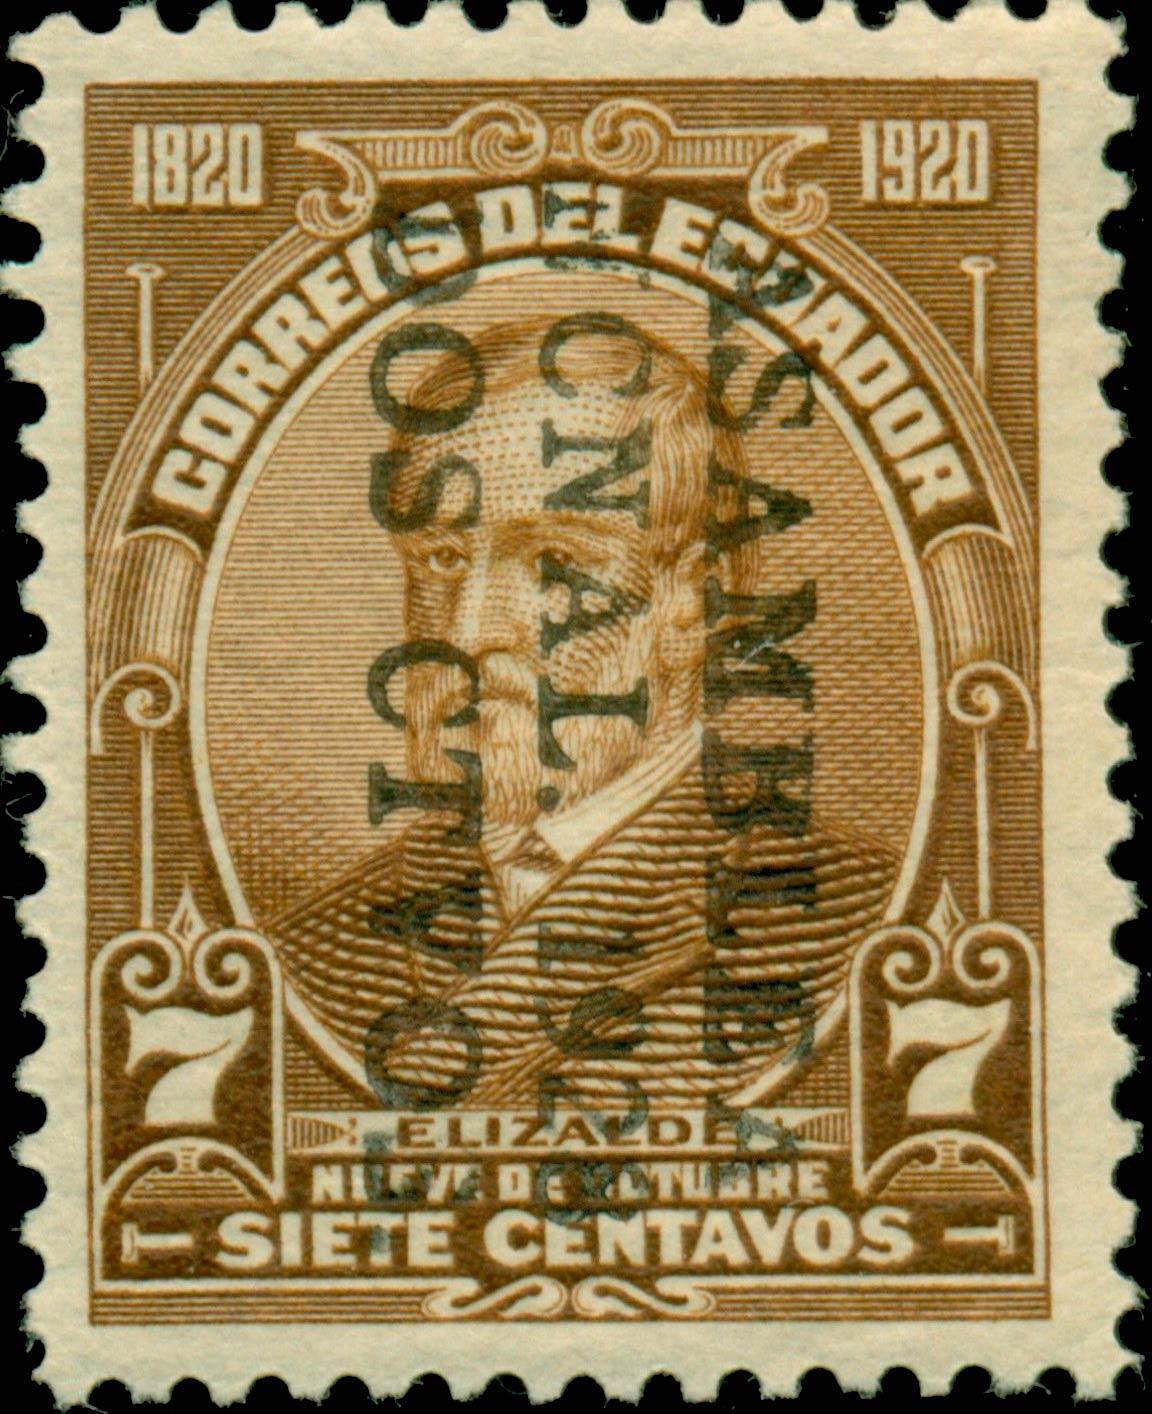 Ecuador_1920_Elizalde_7c_Sc282_Surcharged_Forgery